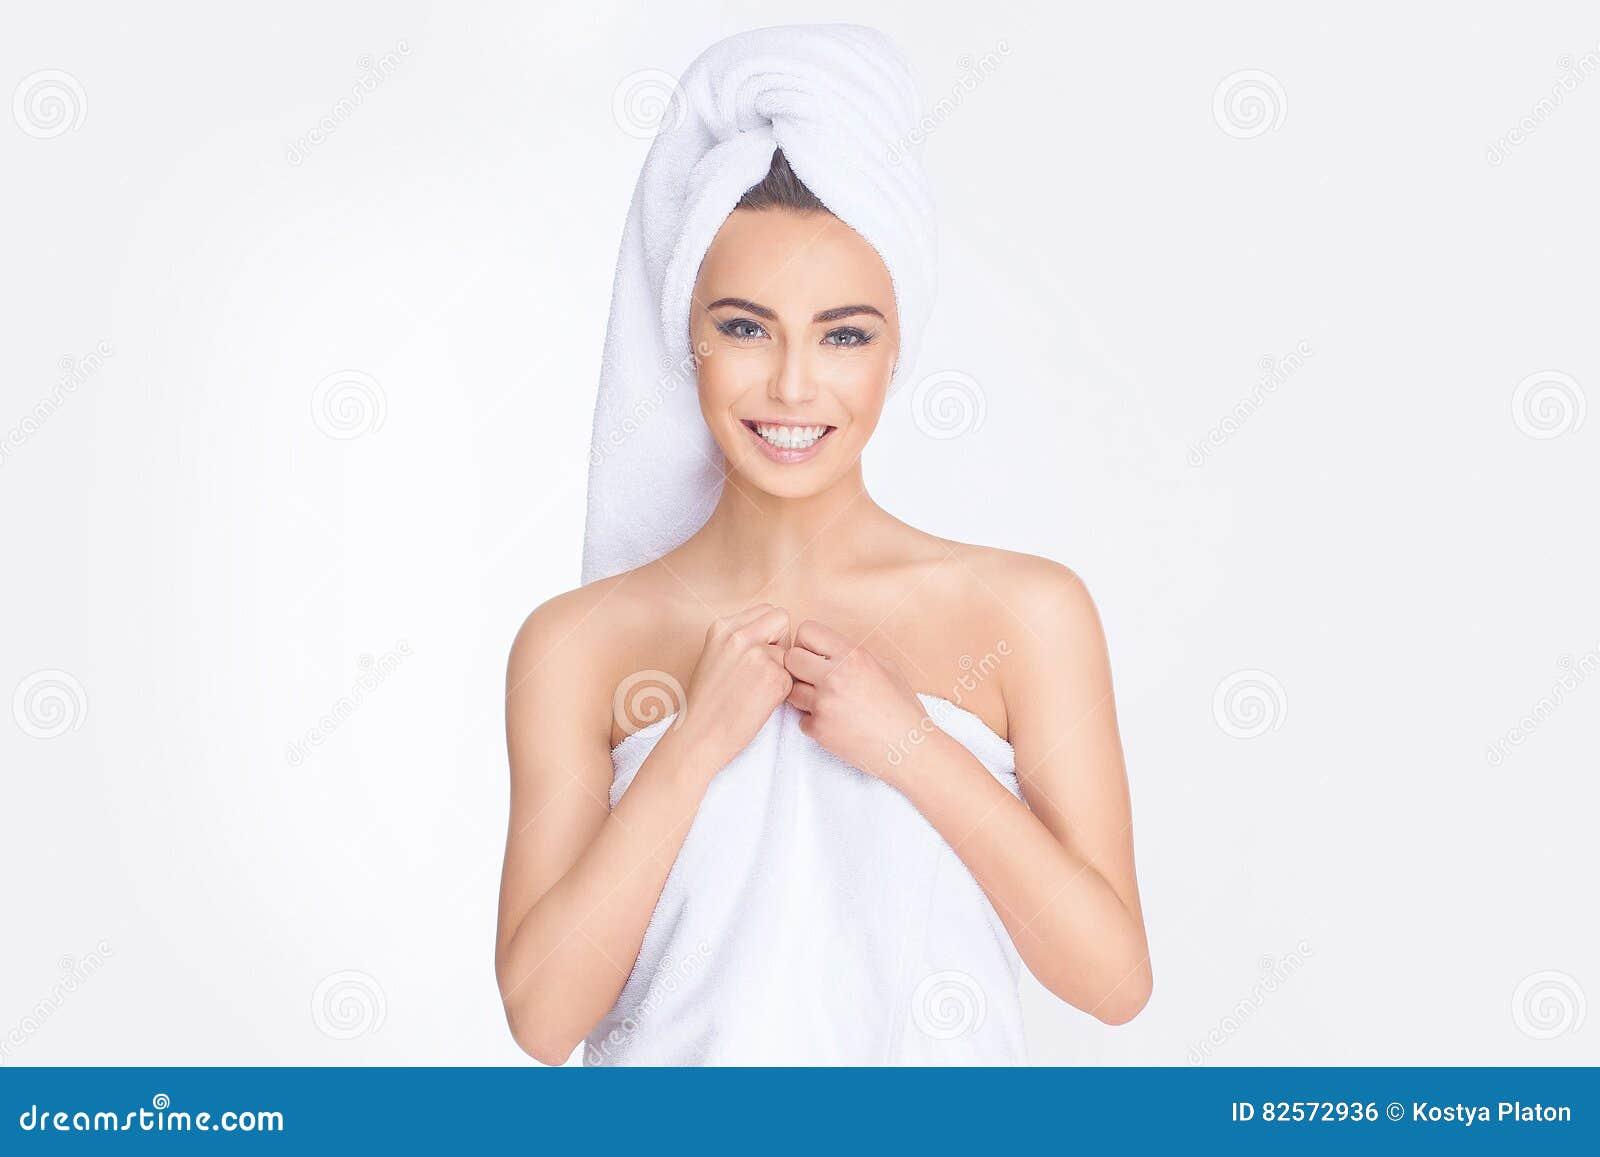 Badekurort Entspannte junge Frau